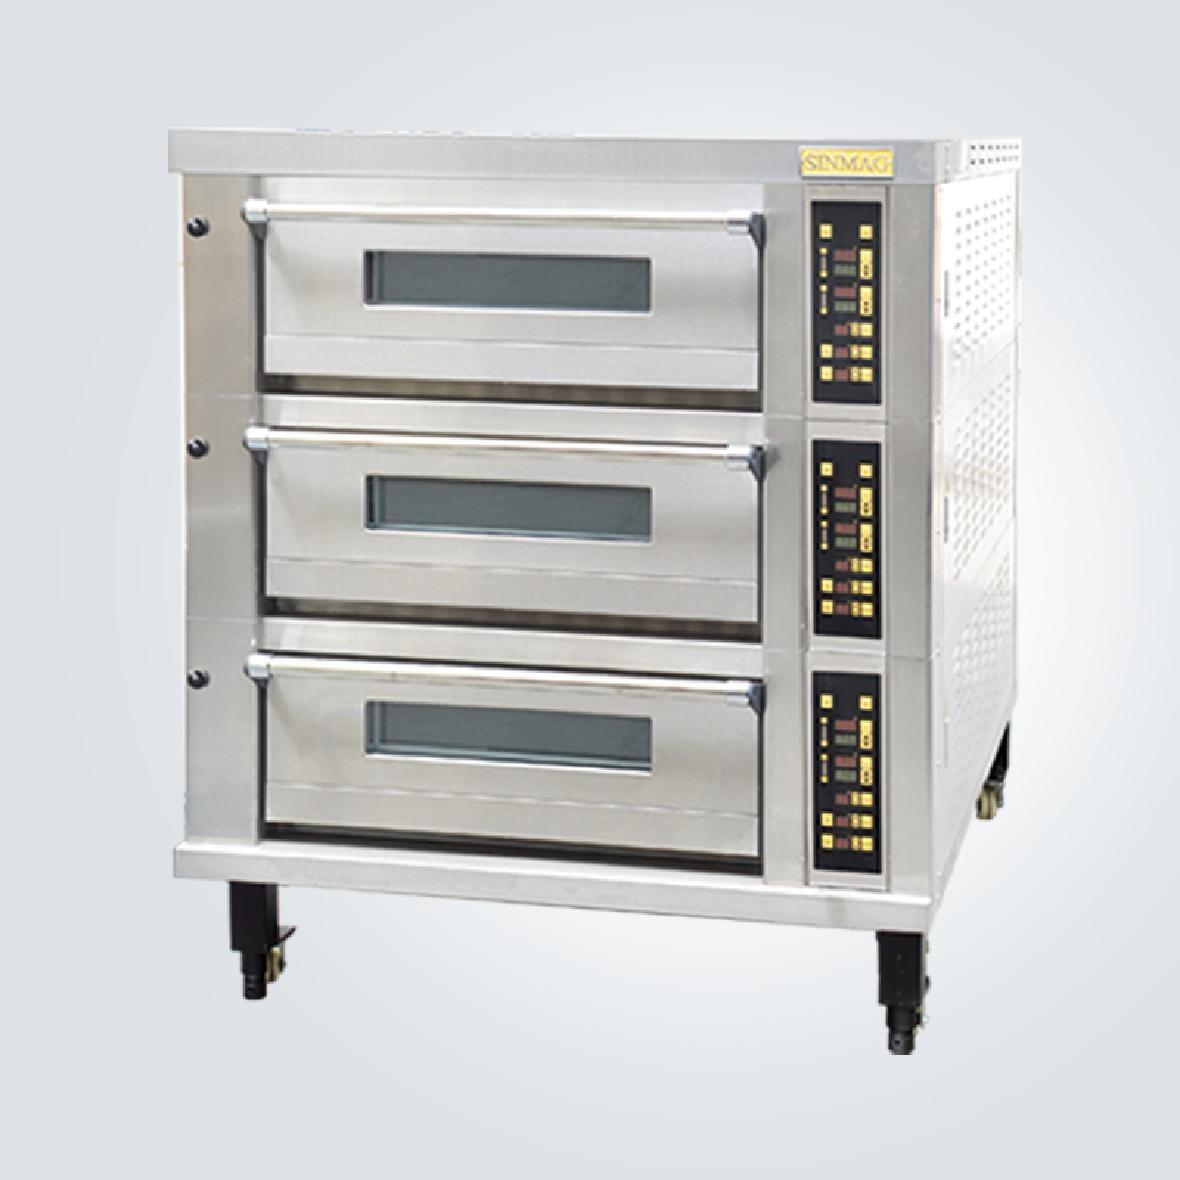 電烤爐 SK2-623